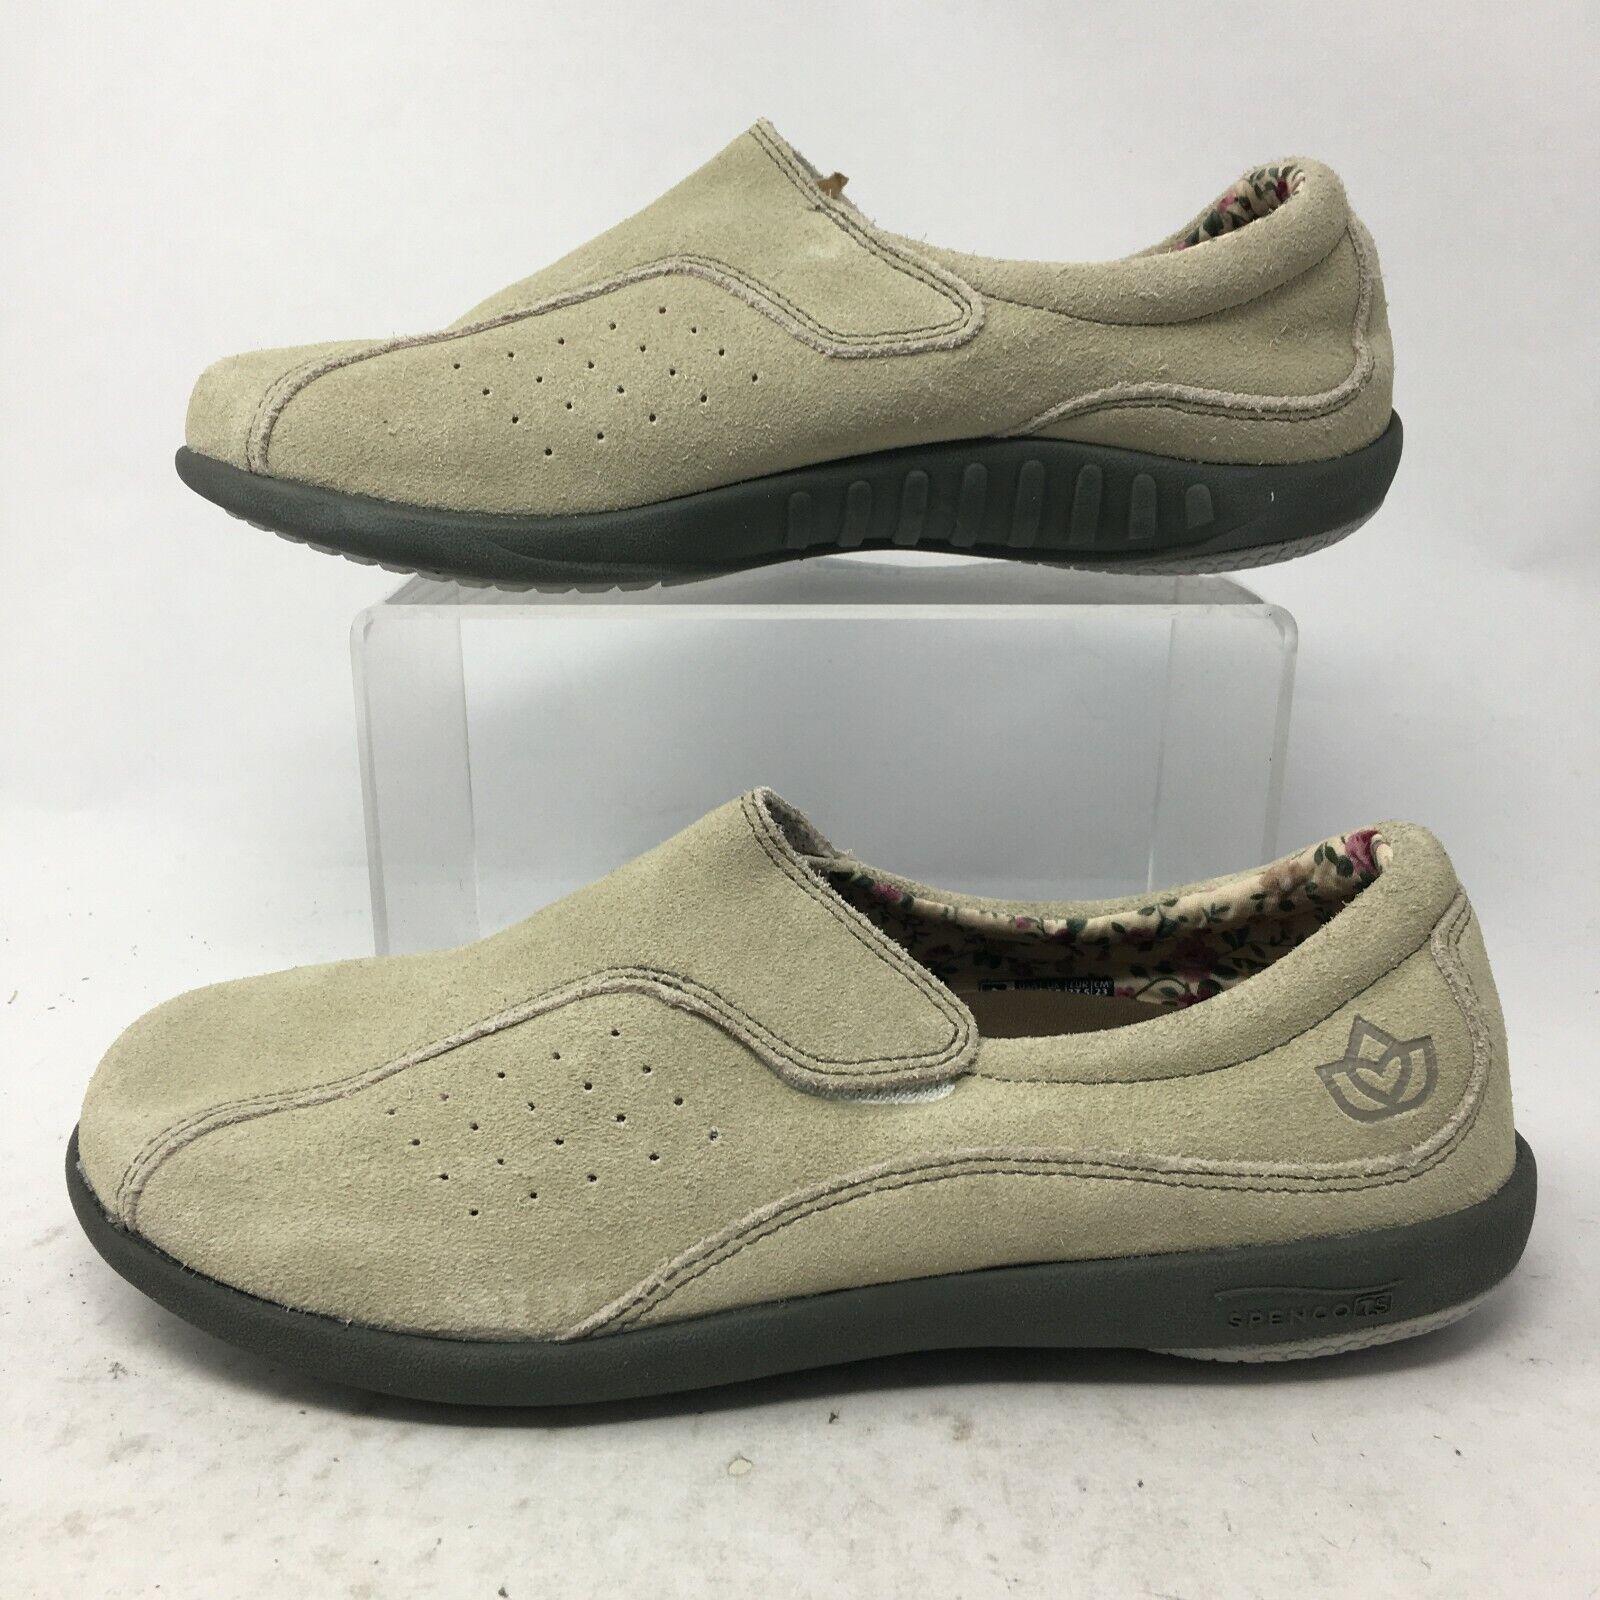 Spenco Womens 7 Casual Loafers Slip On Comfort Shoes Beige Leather Hook & Loop